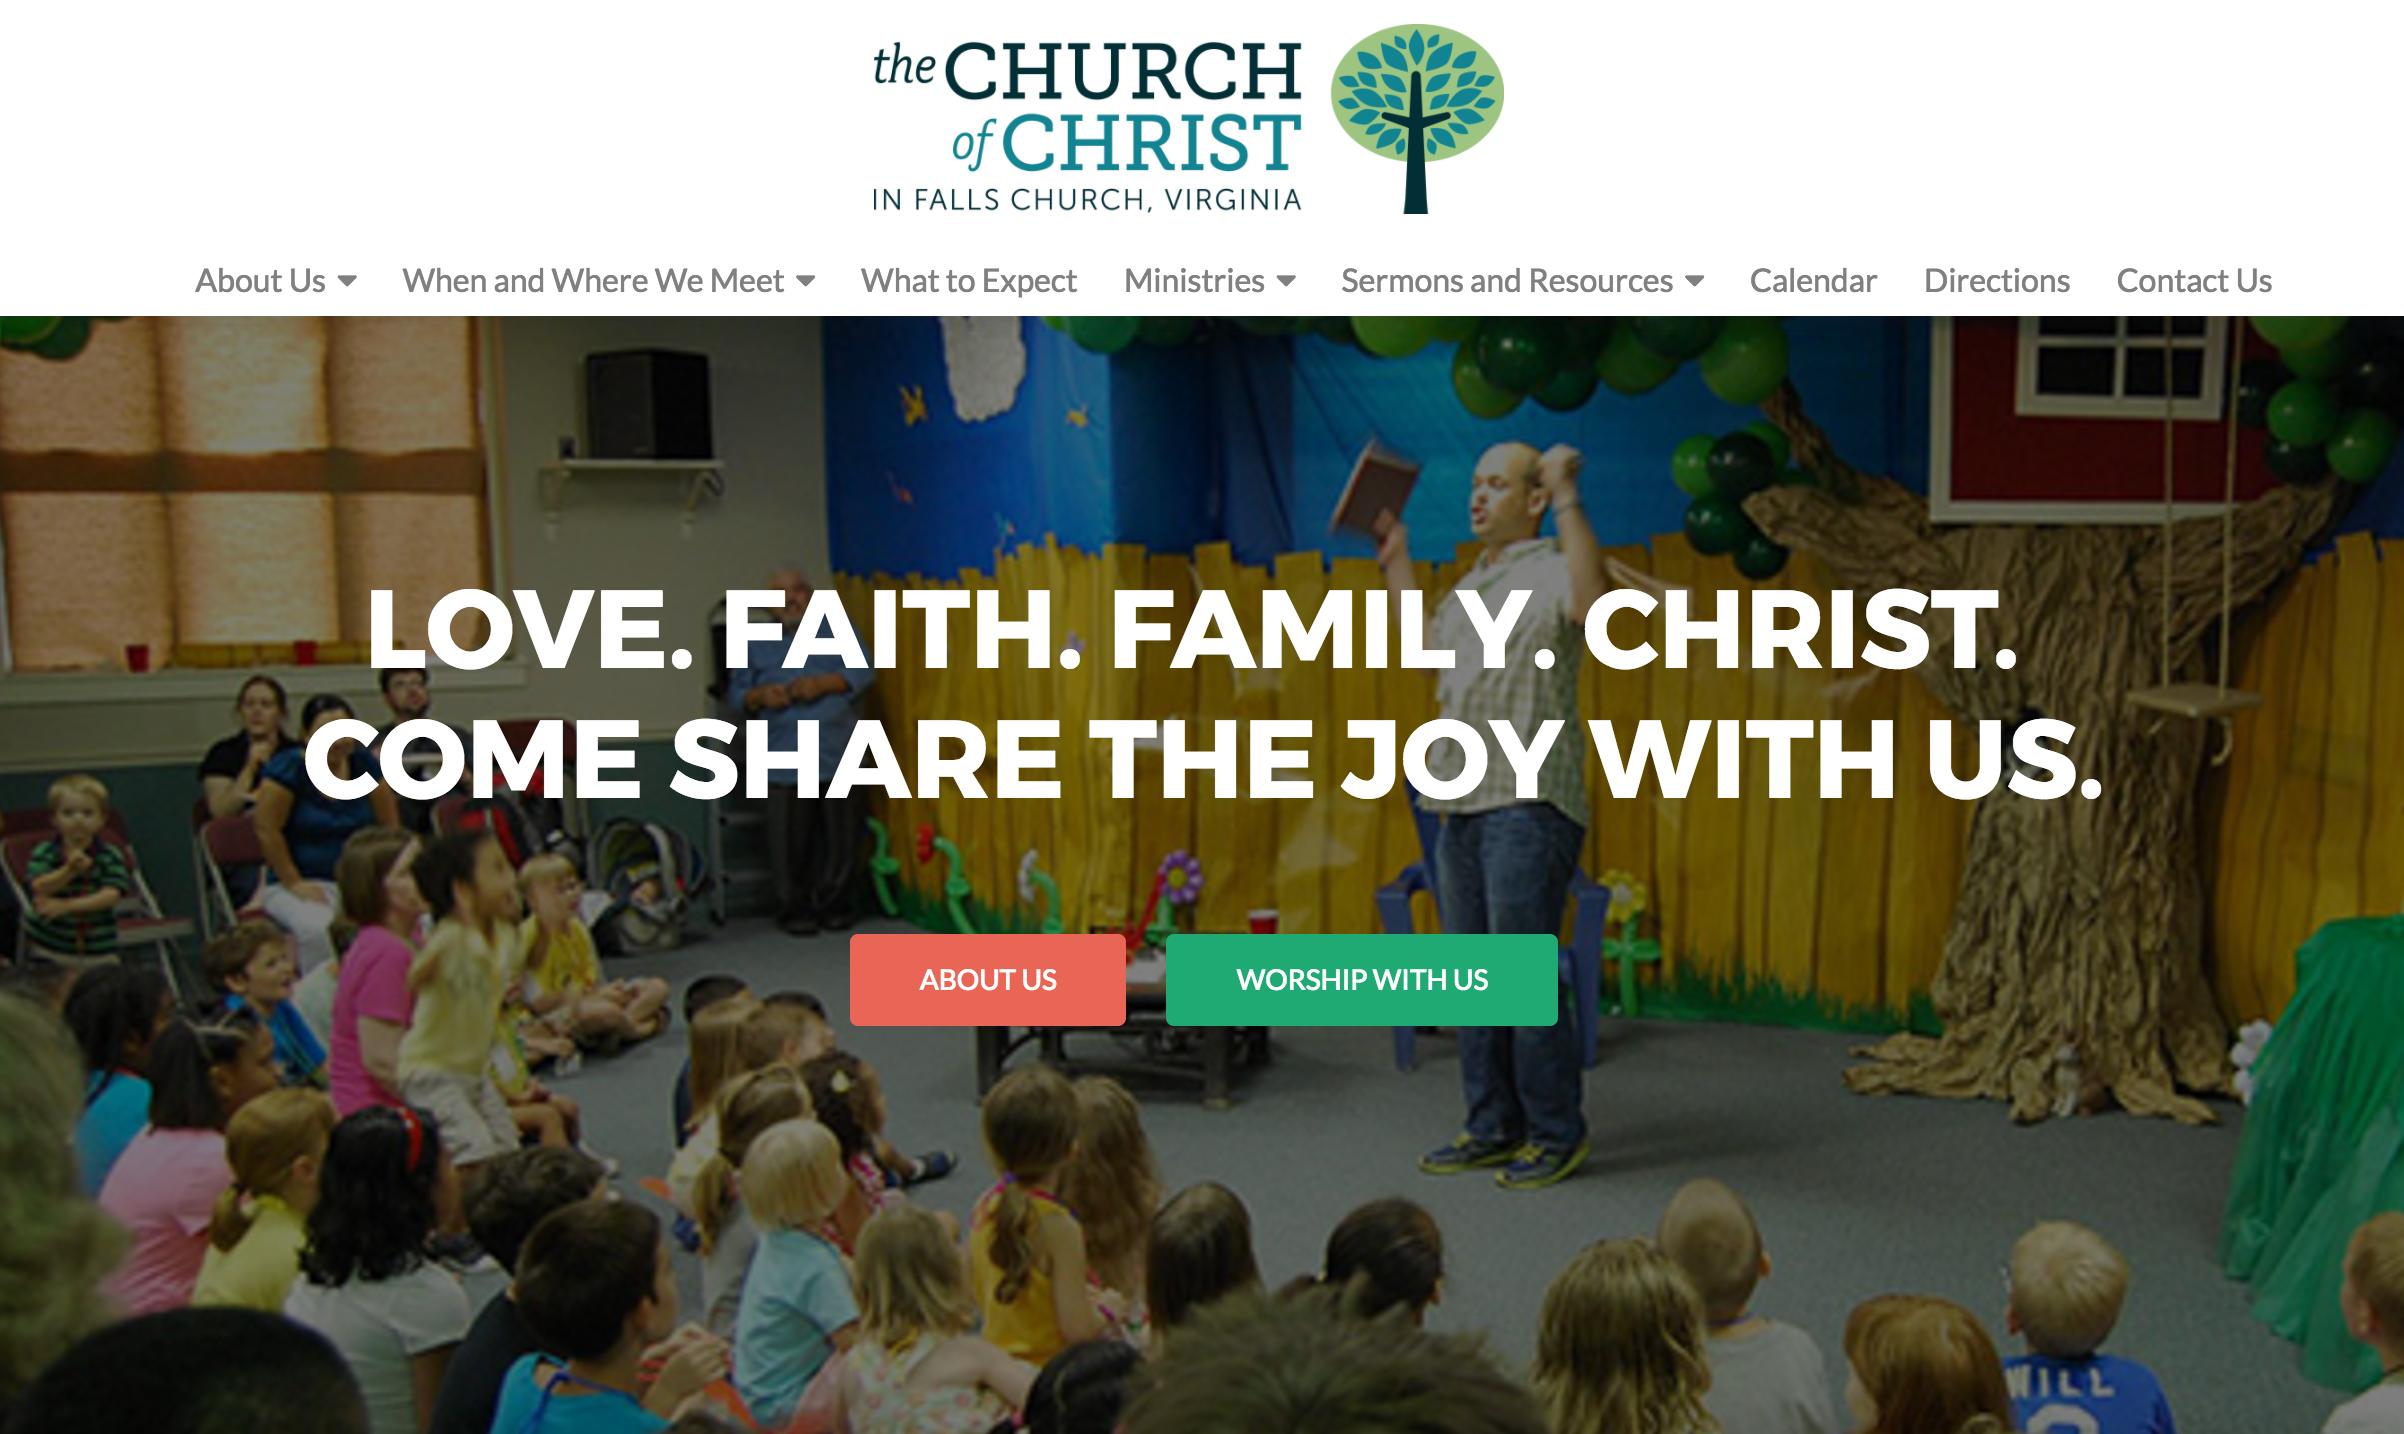 Church of Christ in Falls Church, Va.